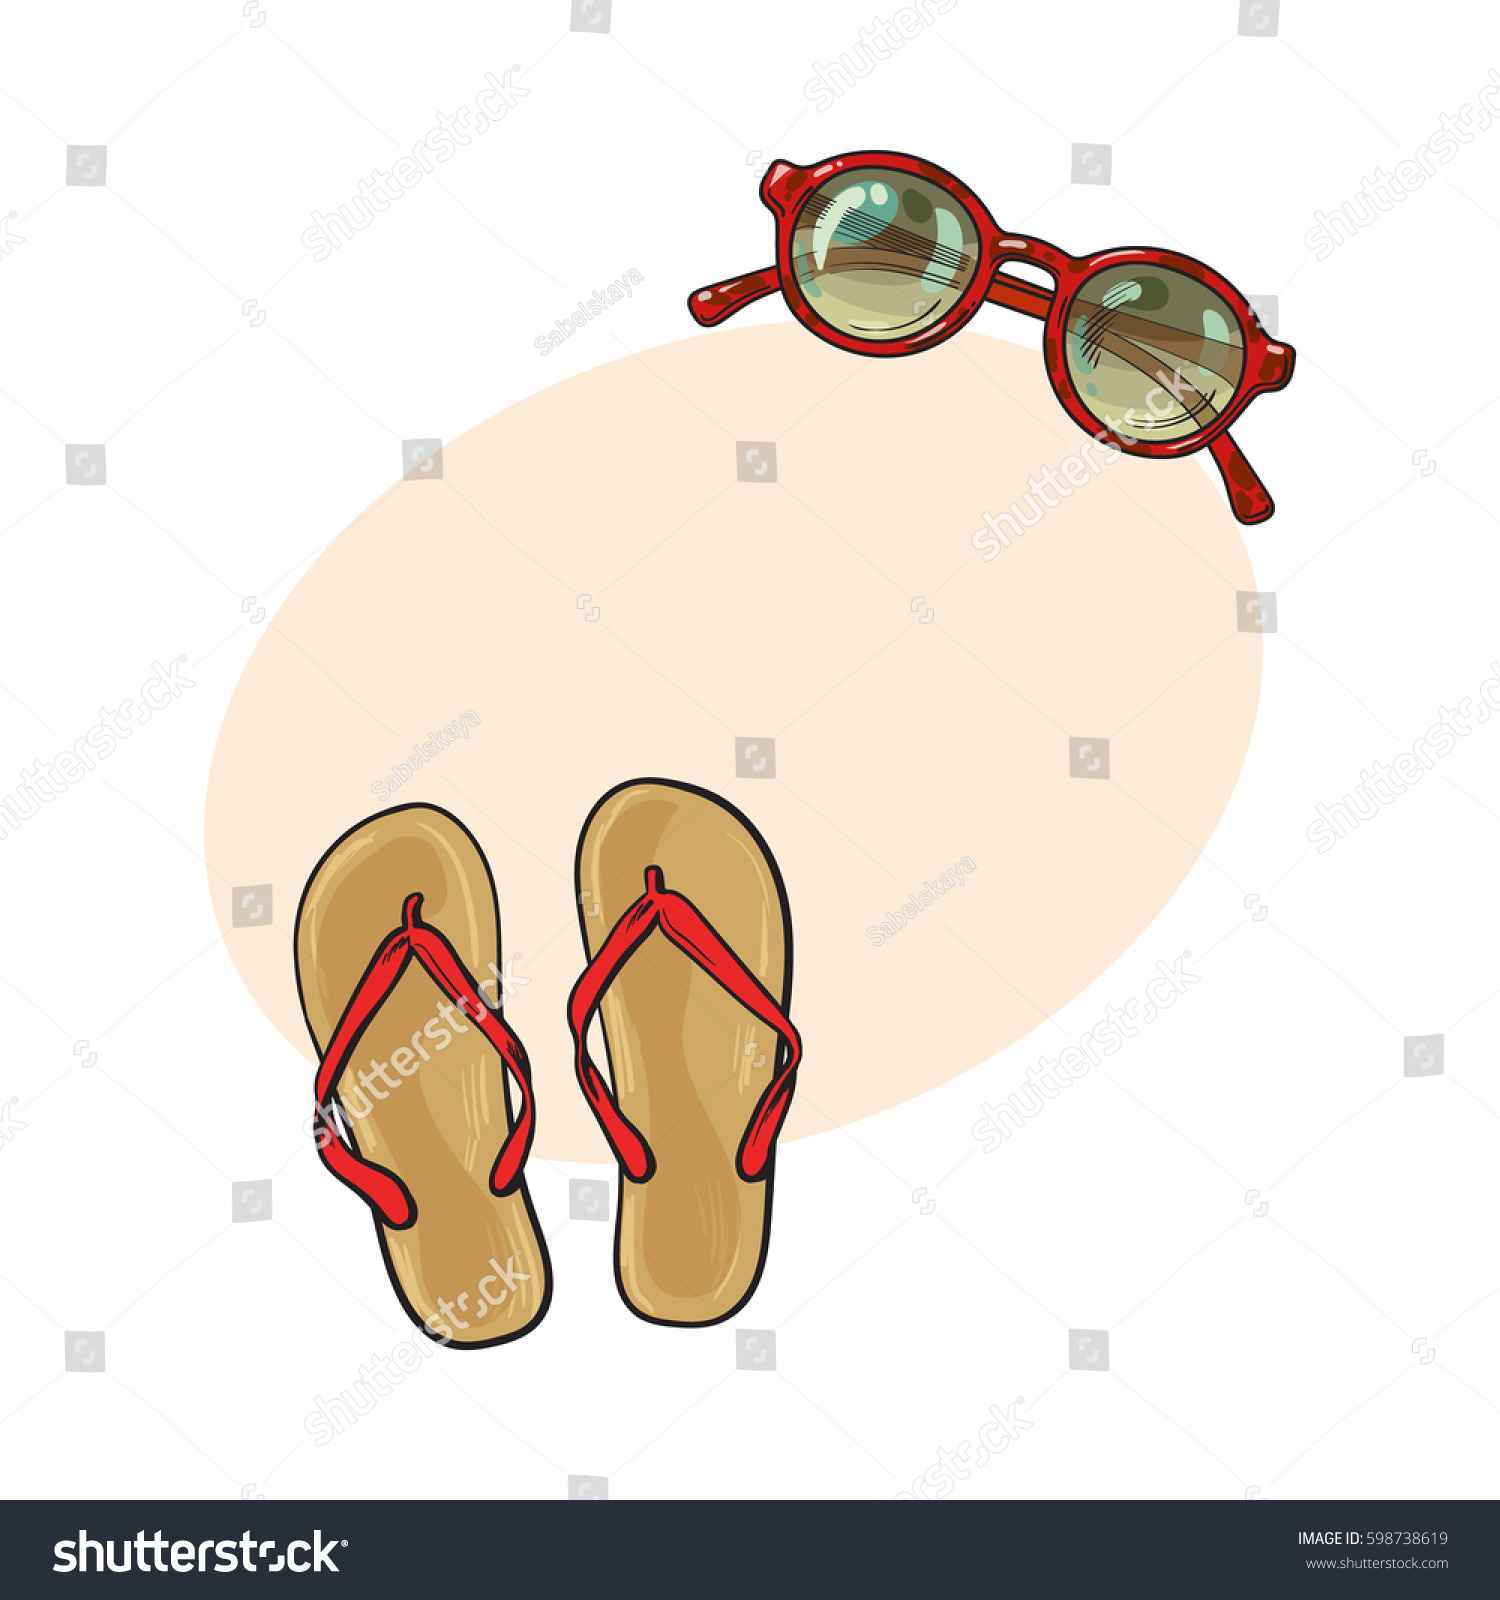 0e37f3f3b9593 Pair Flip Flops Round Sunglasses Summer Stock Vector (Royalty Free ...